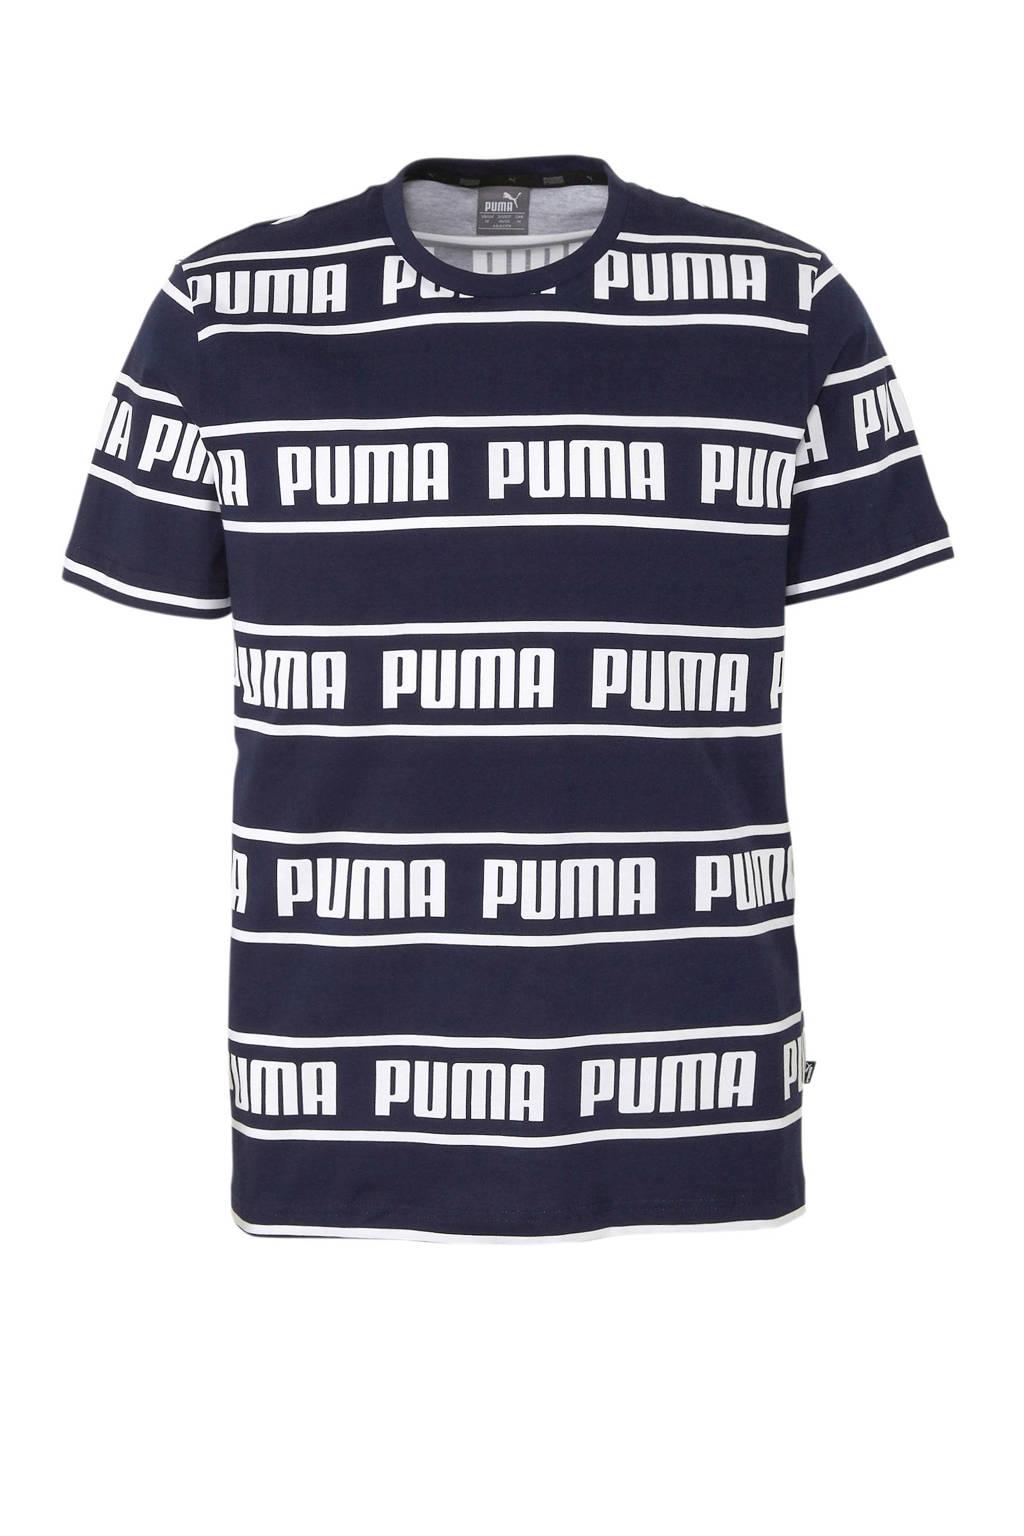 Puma   T-shirt donkerblauw/wit, Donkerblauw/wit